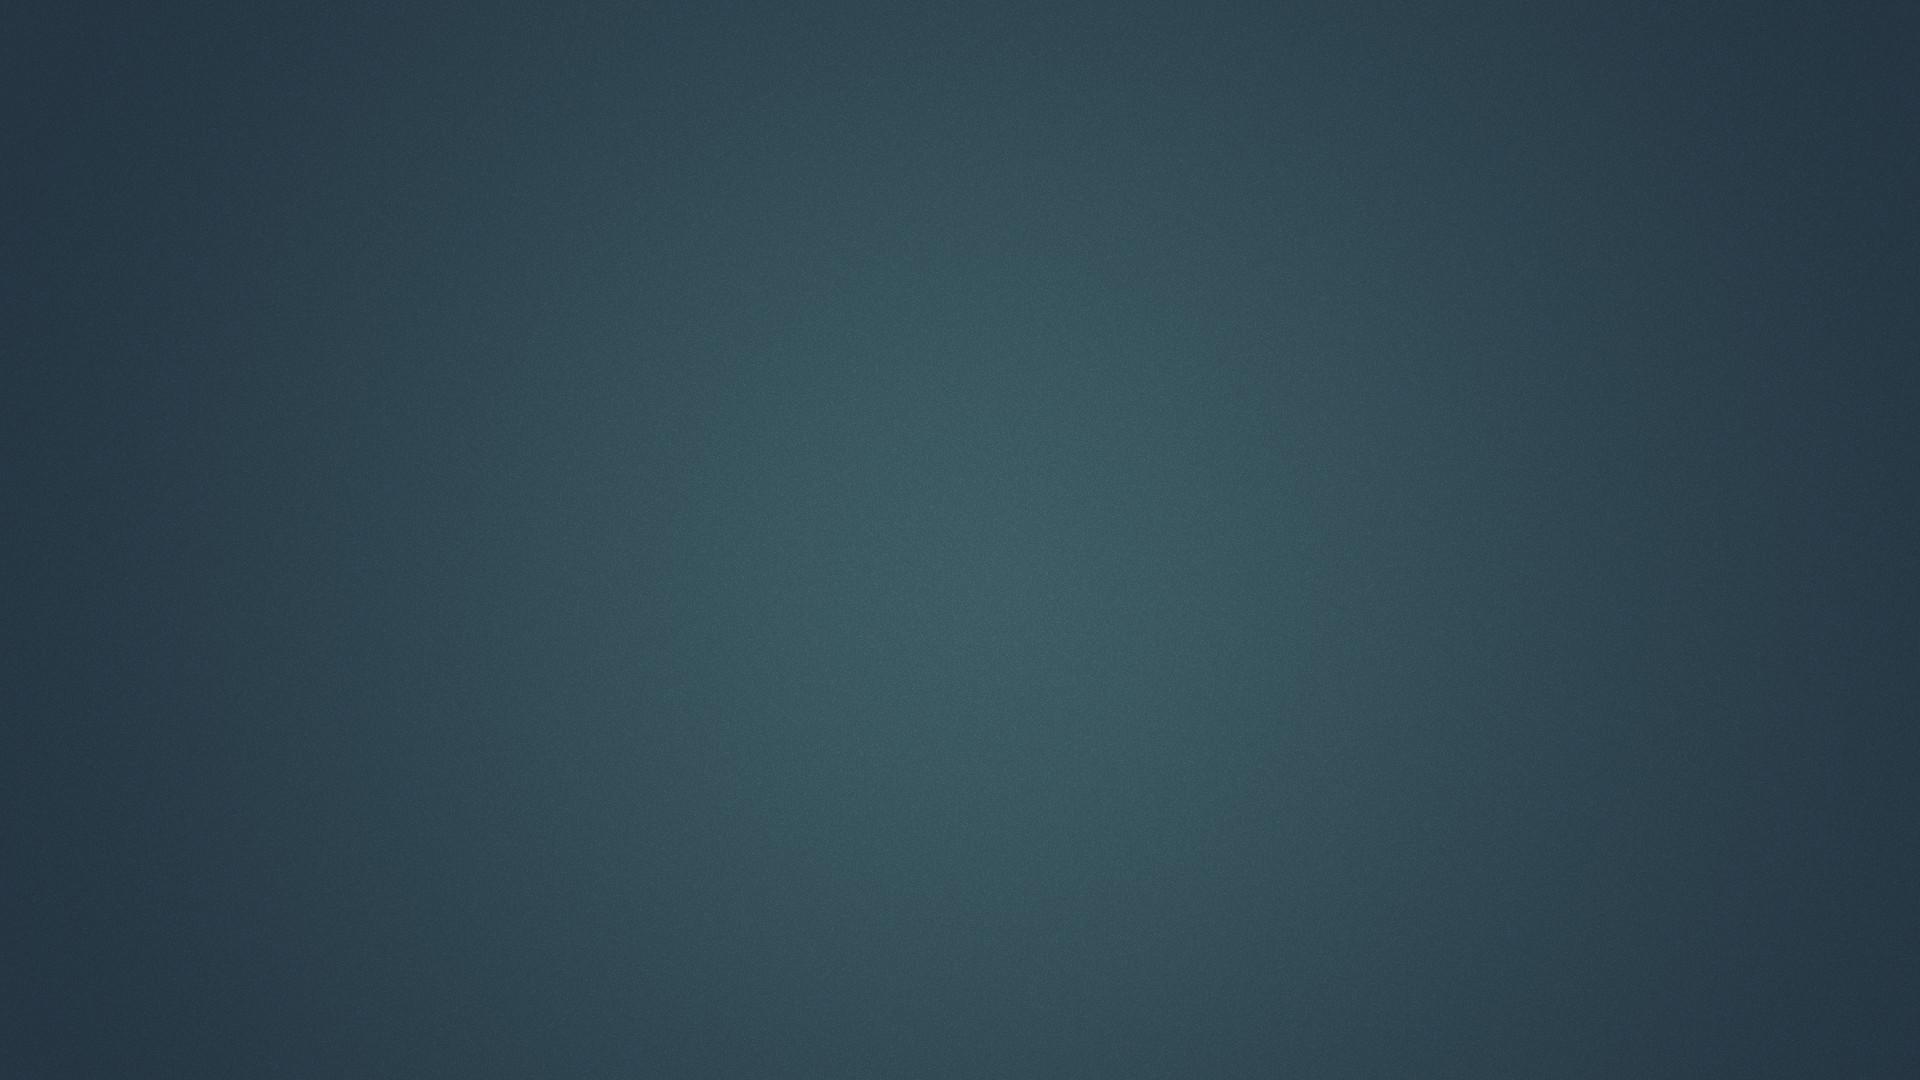 LinkedIn Background Photography